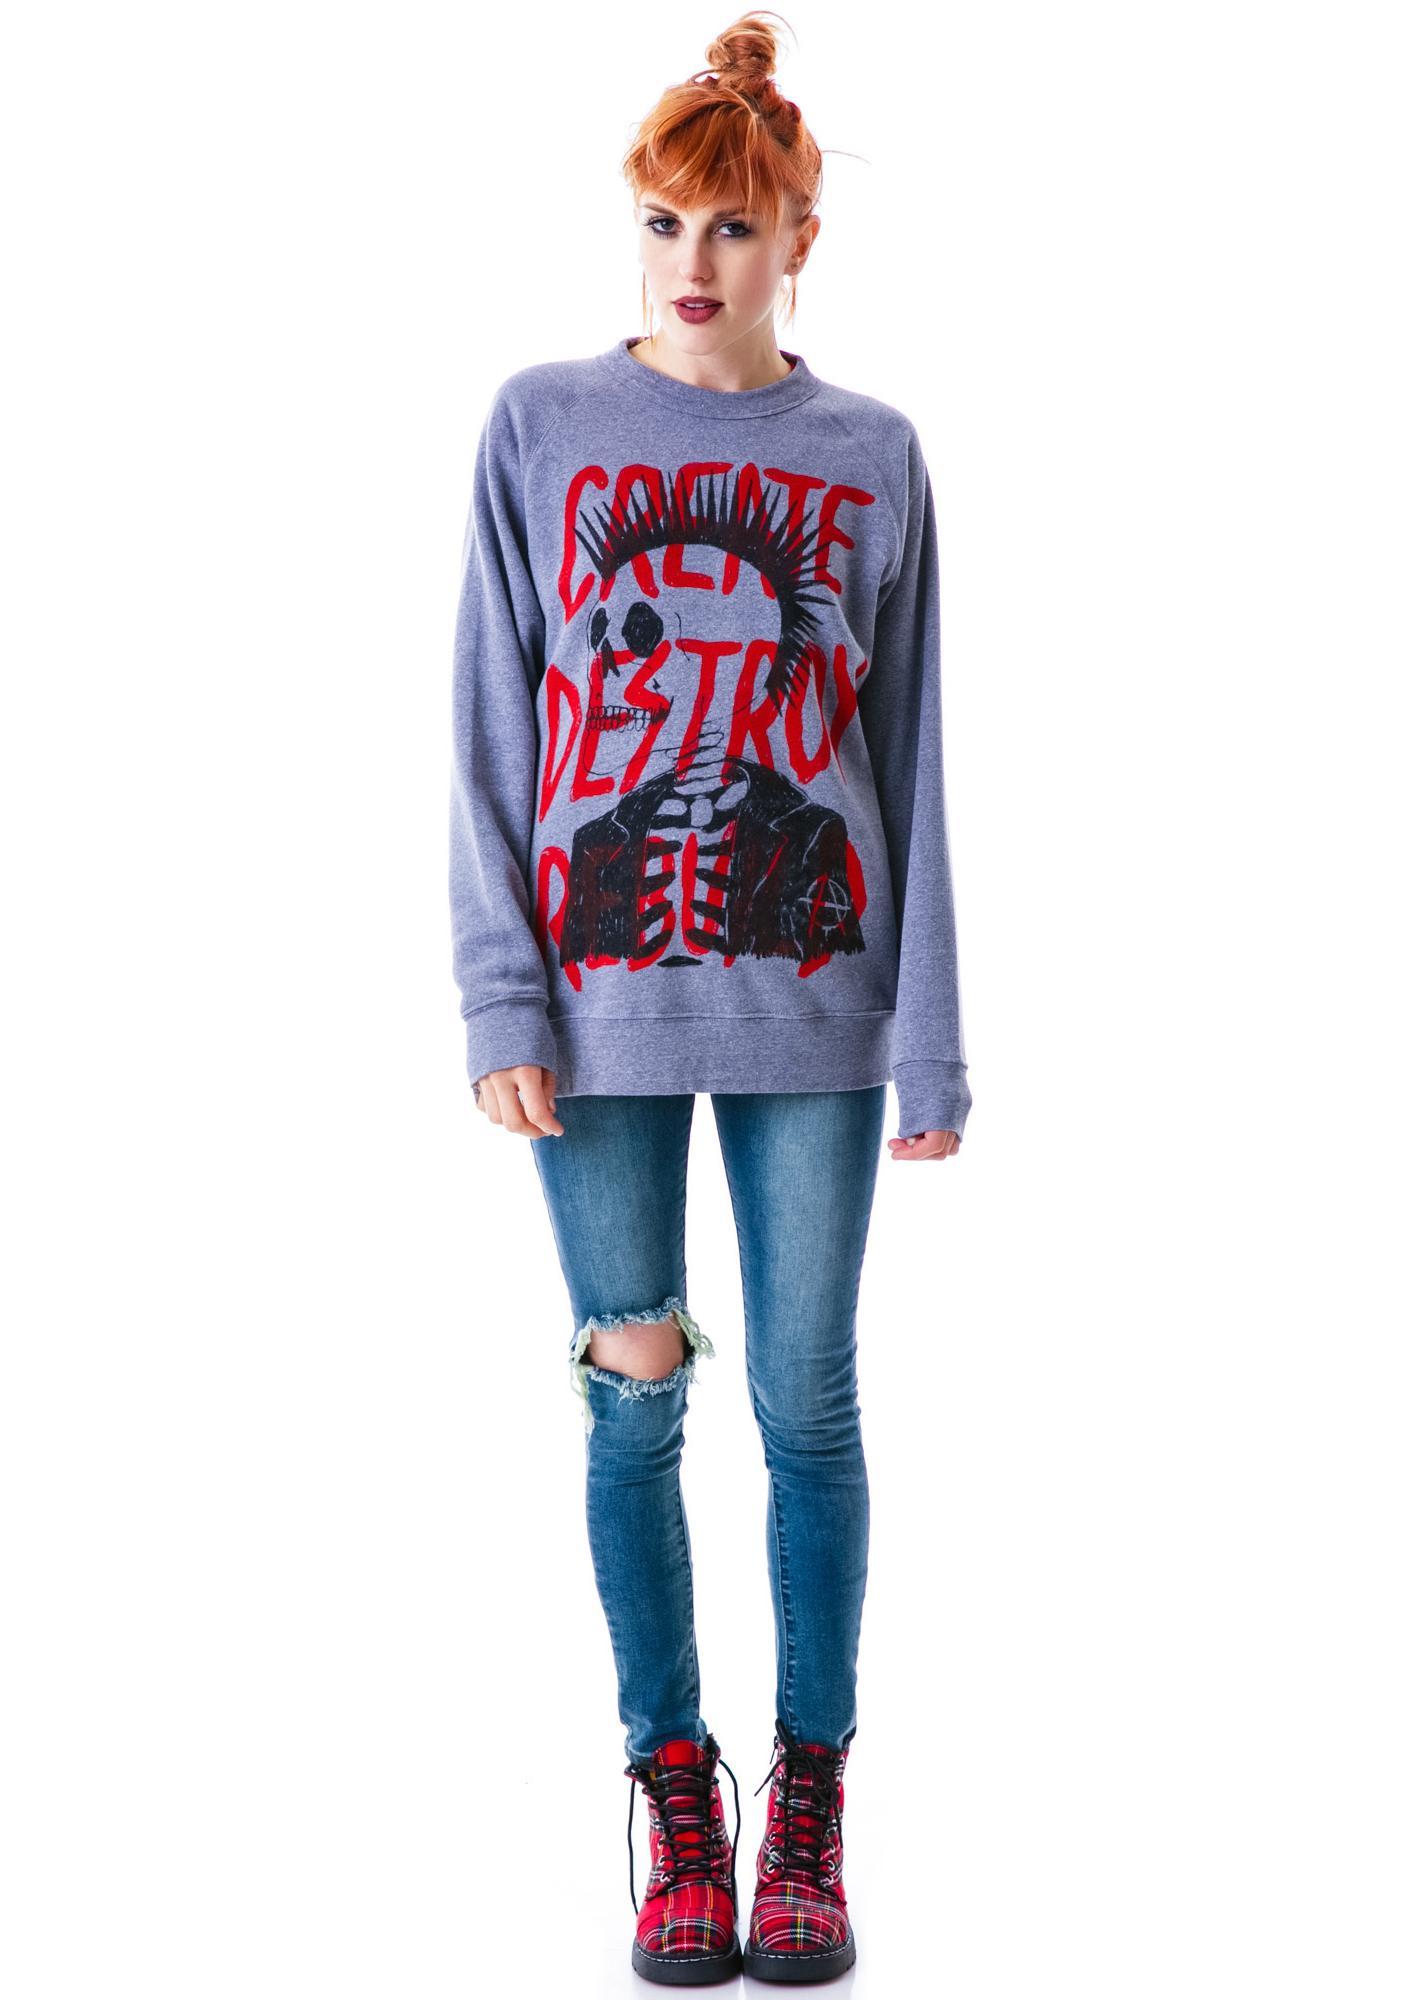 Glamour Kills The Cult Classic Crew Sweatshirt